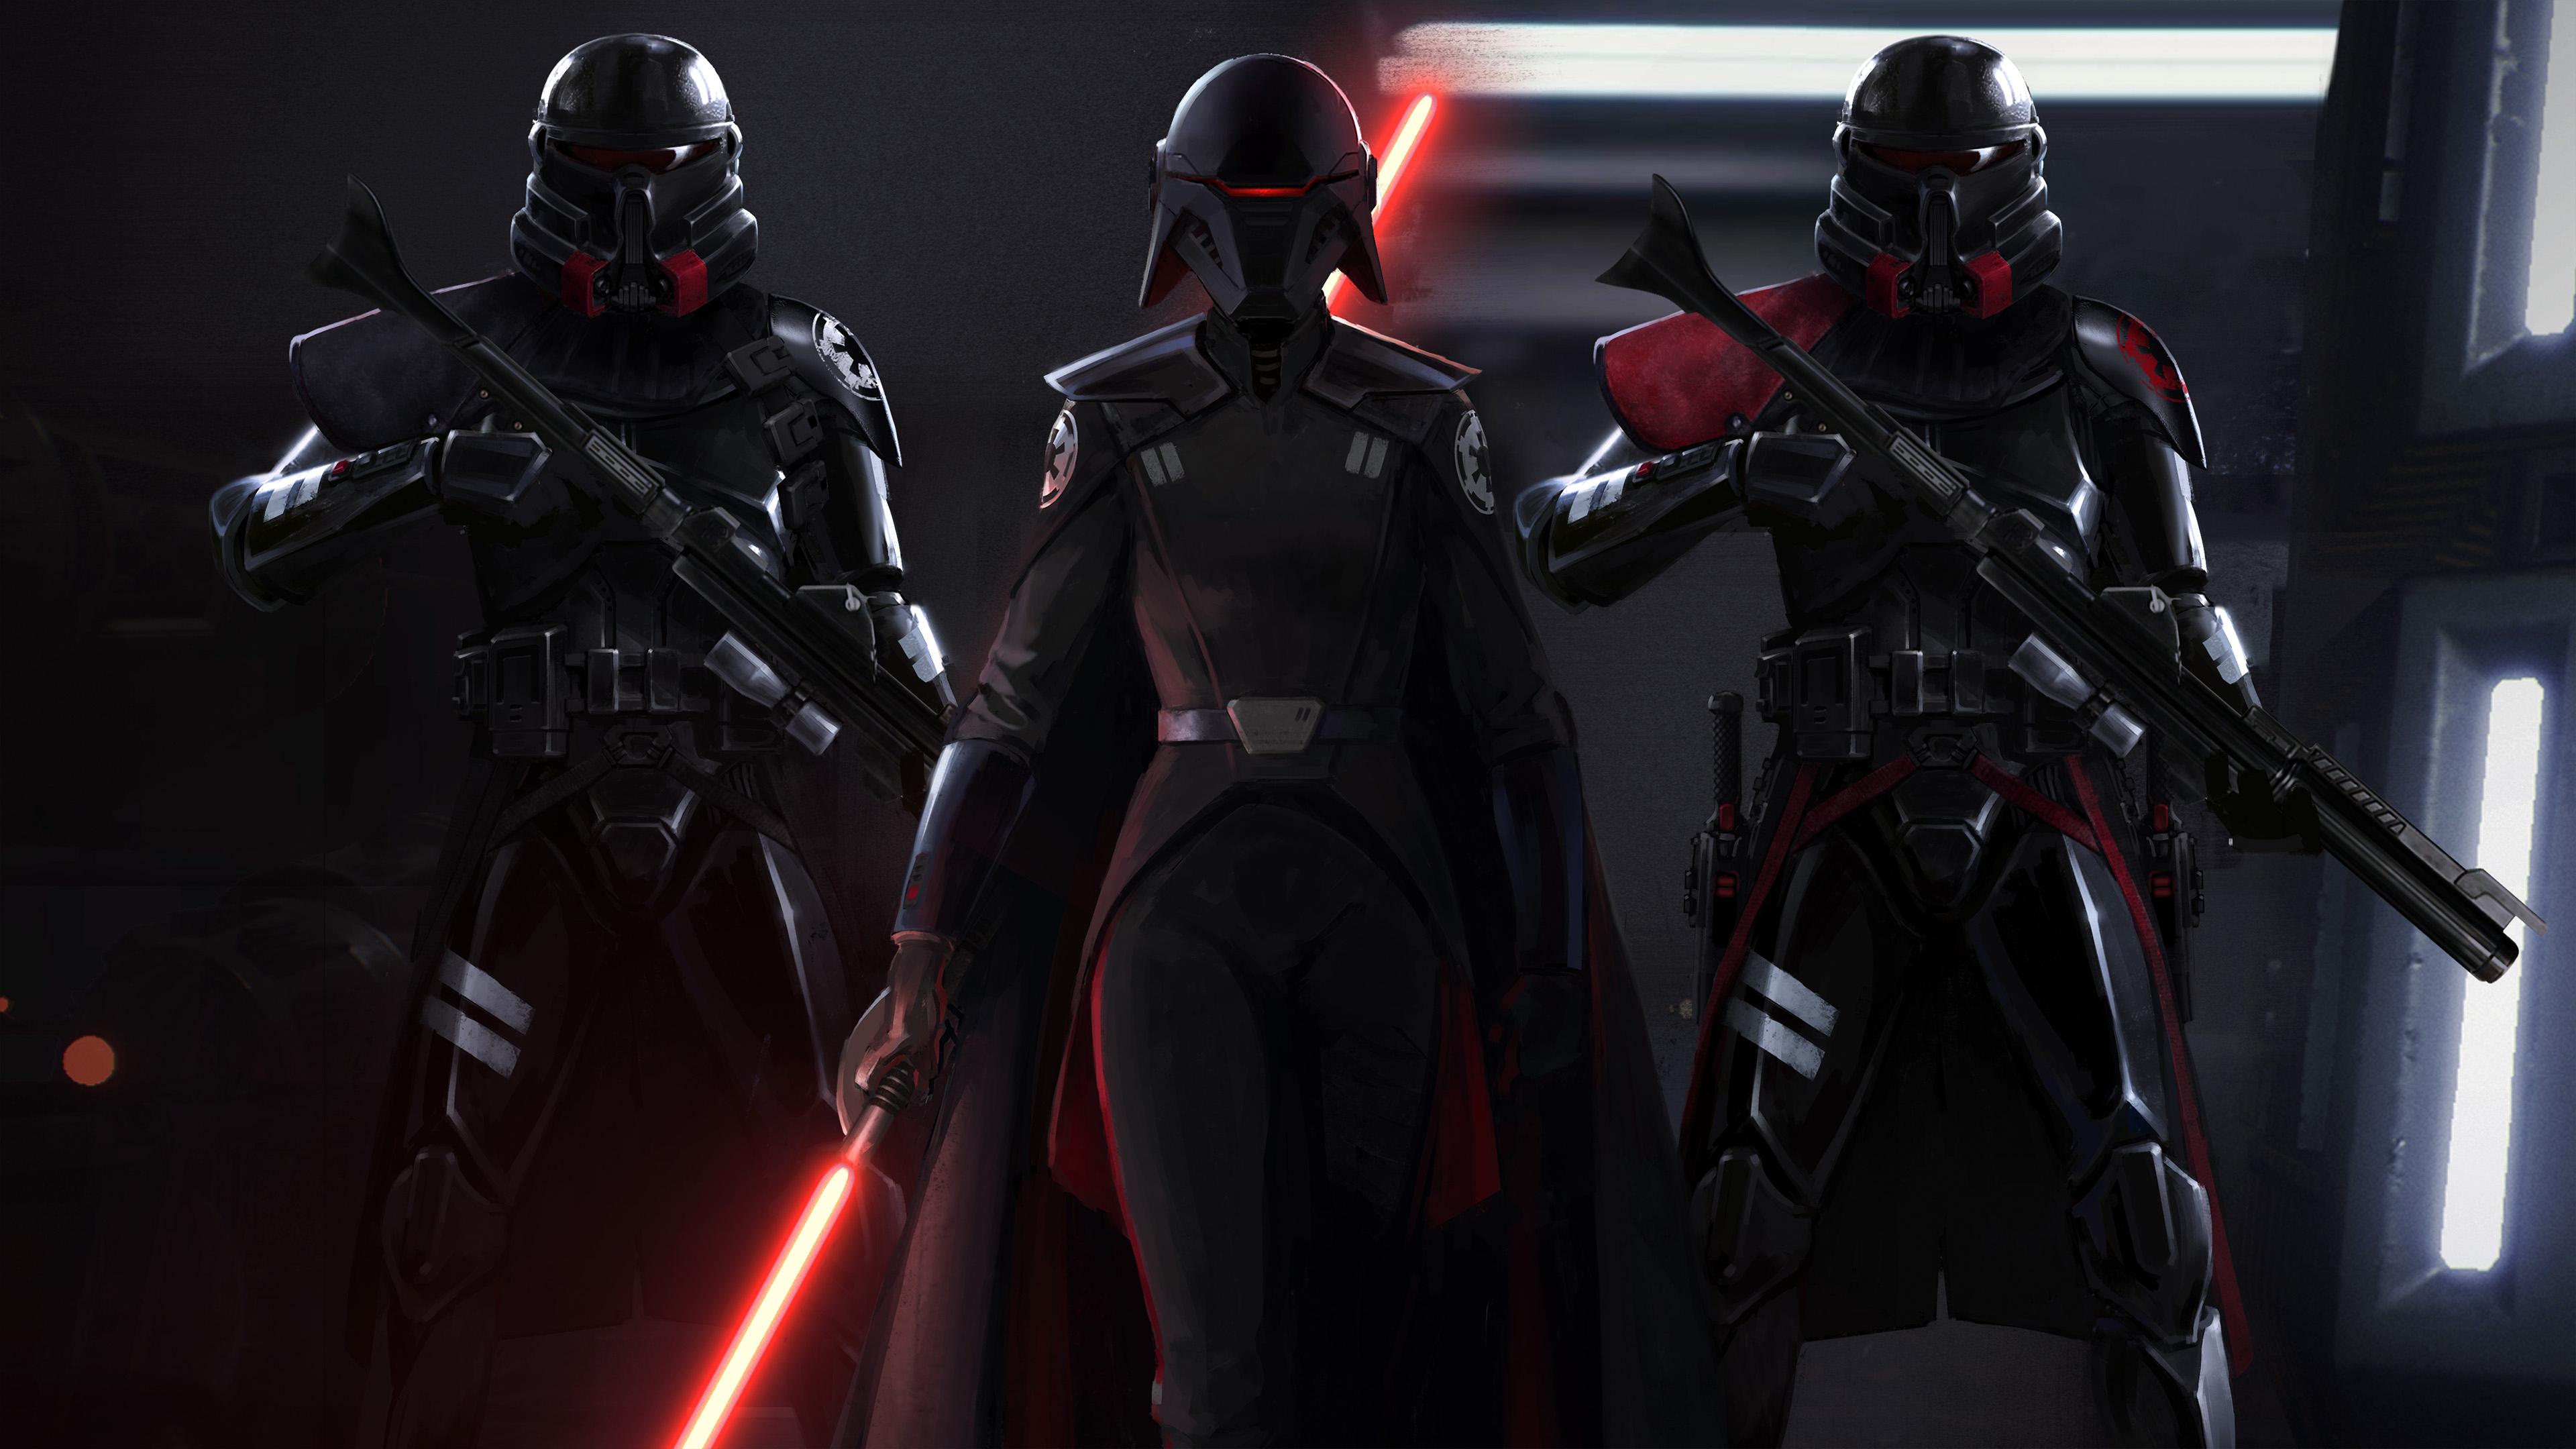 Zendha 1080p Ultra Hd Star Wars Wallpaper